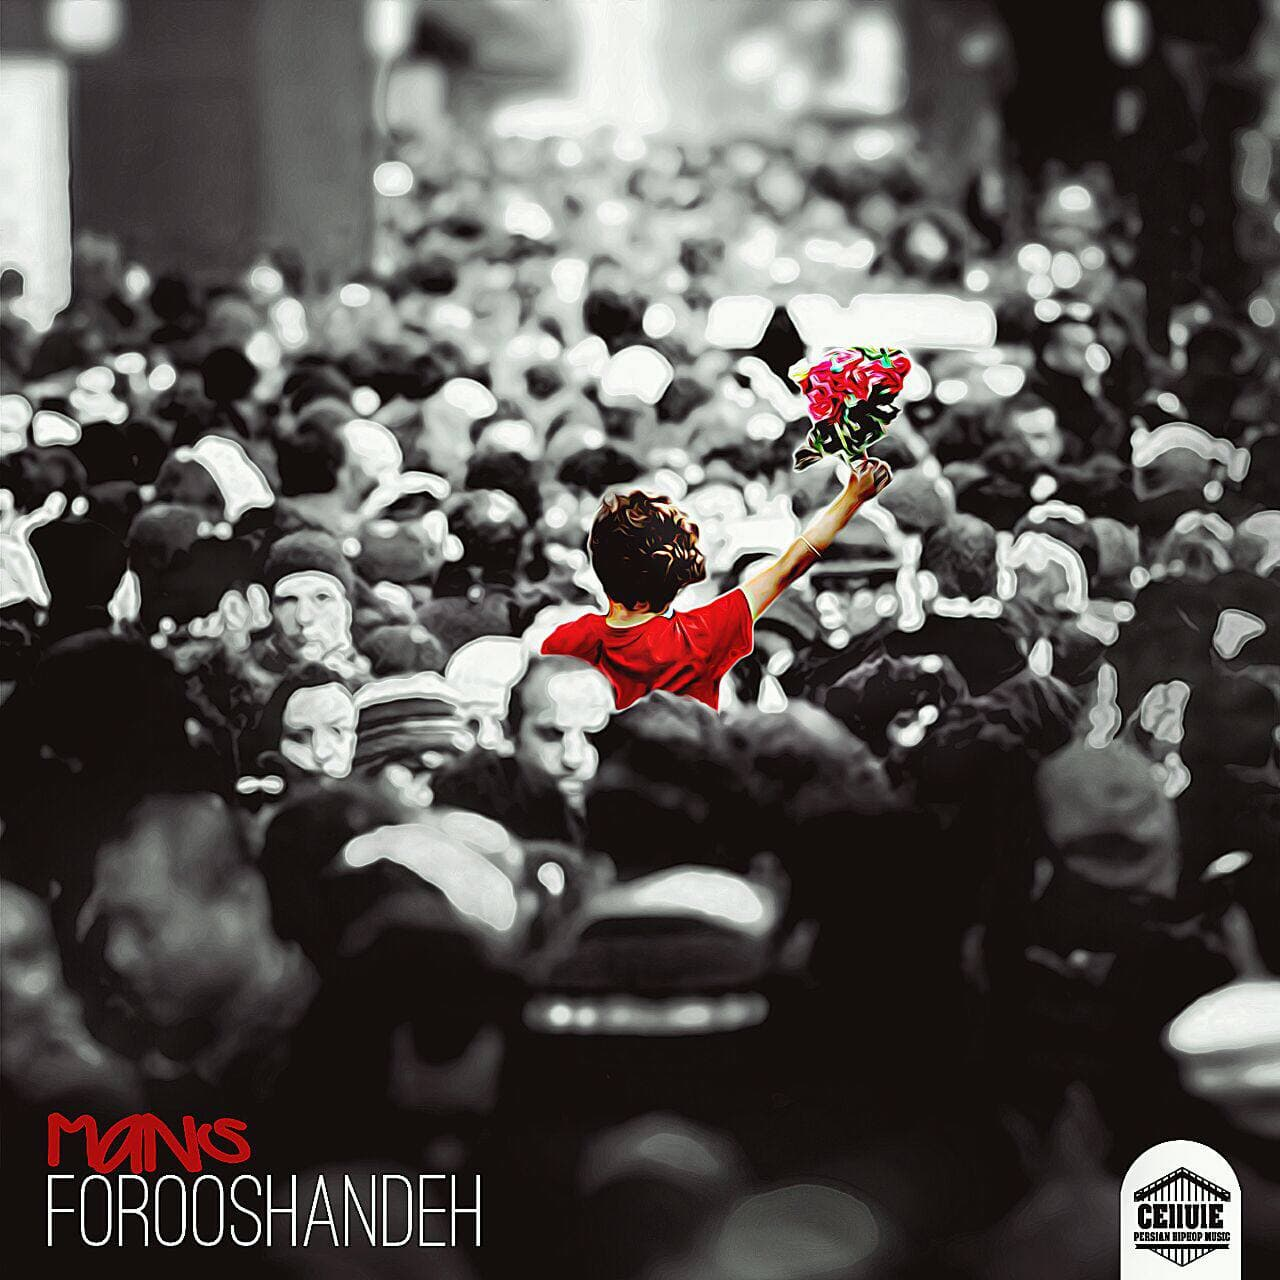 Mans - Forooshandeh